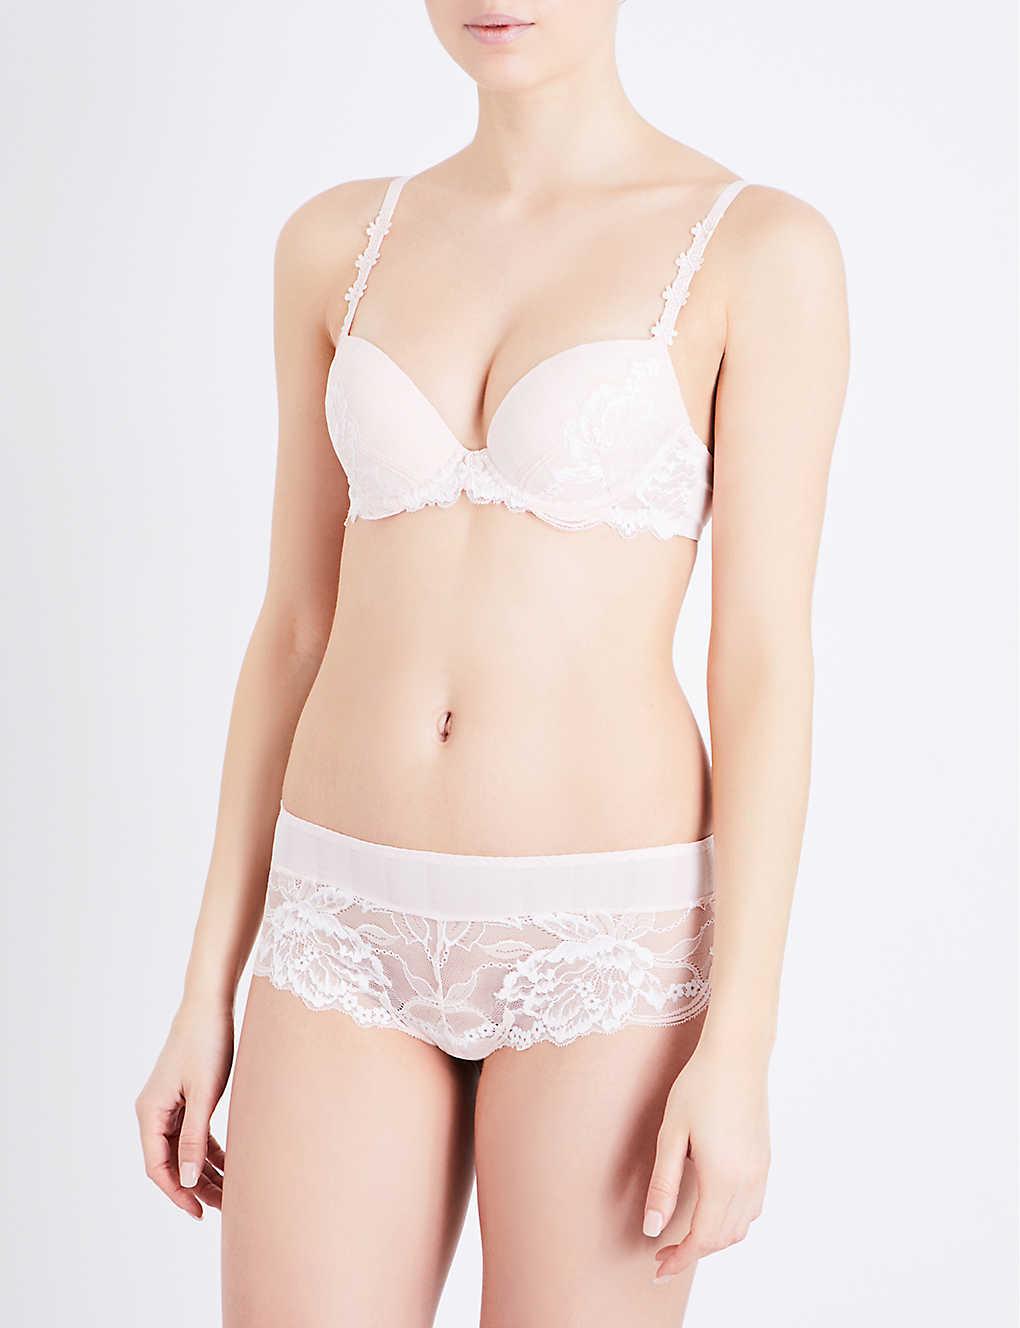 53f4cdc4c72f89 SIMONE PERELE - Amour lace push-up bra | Selfridges.com